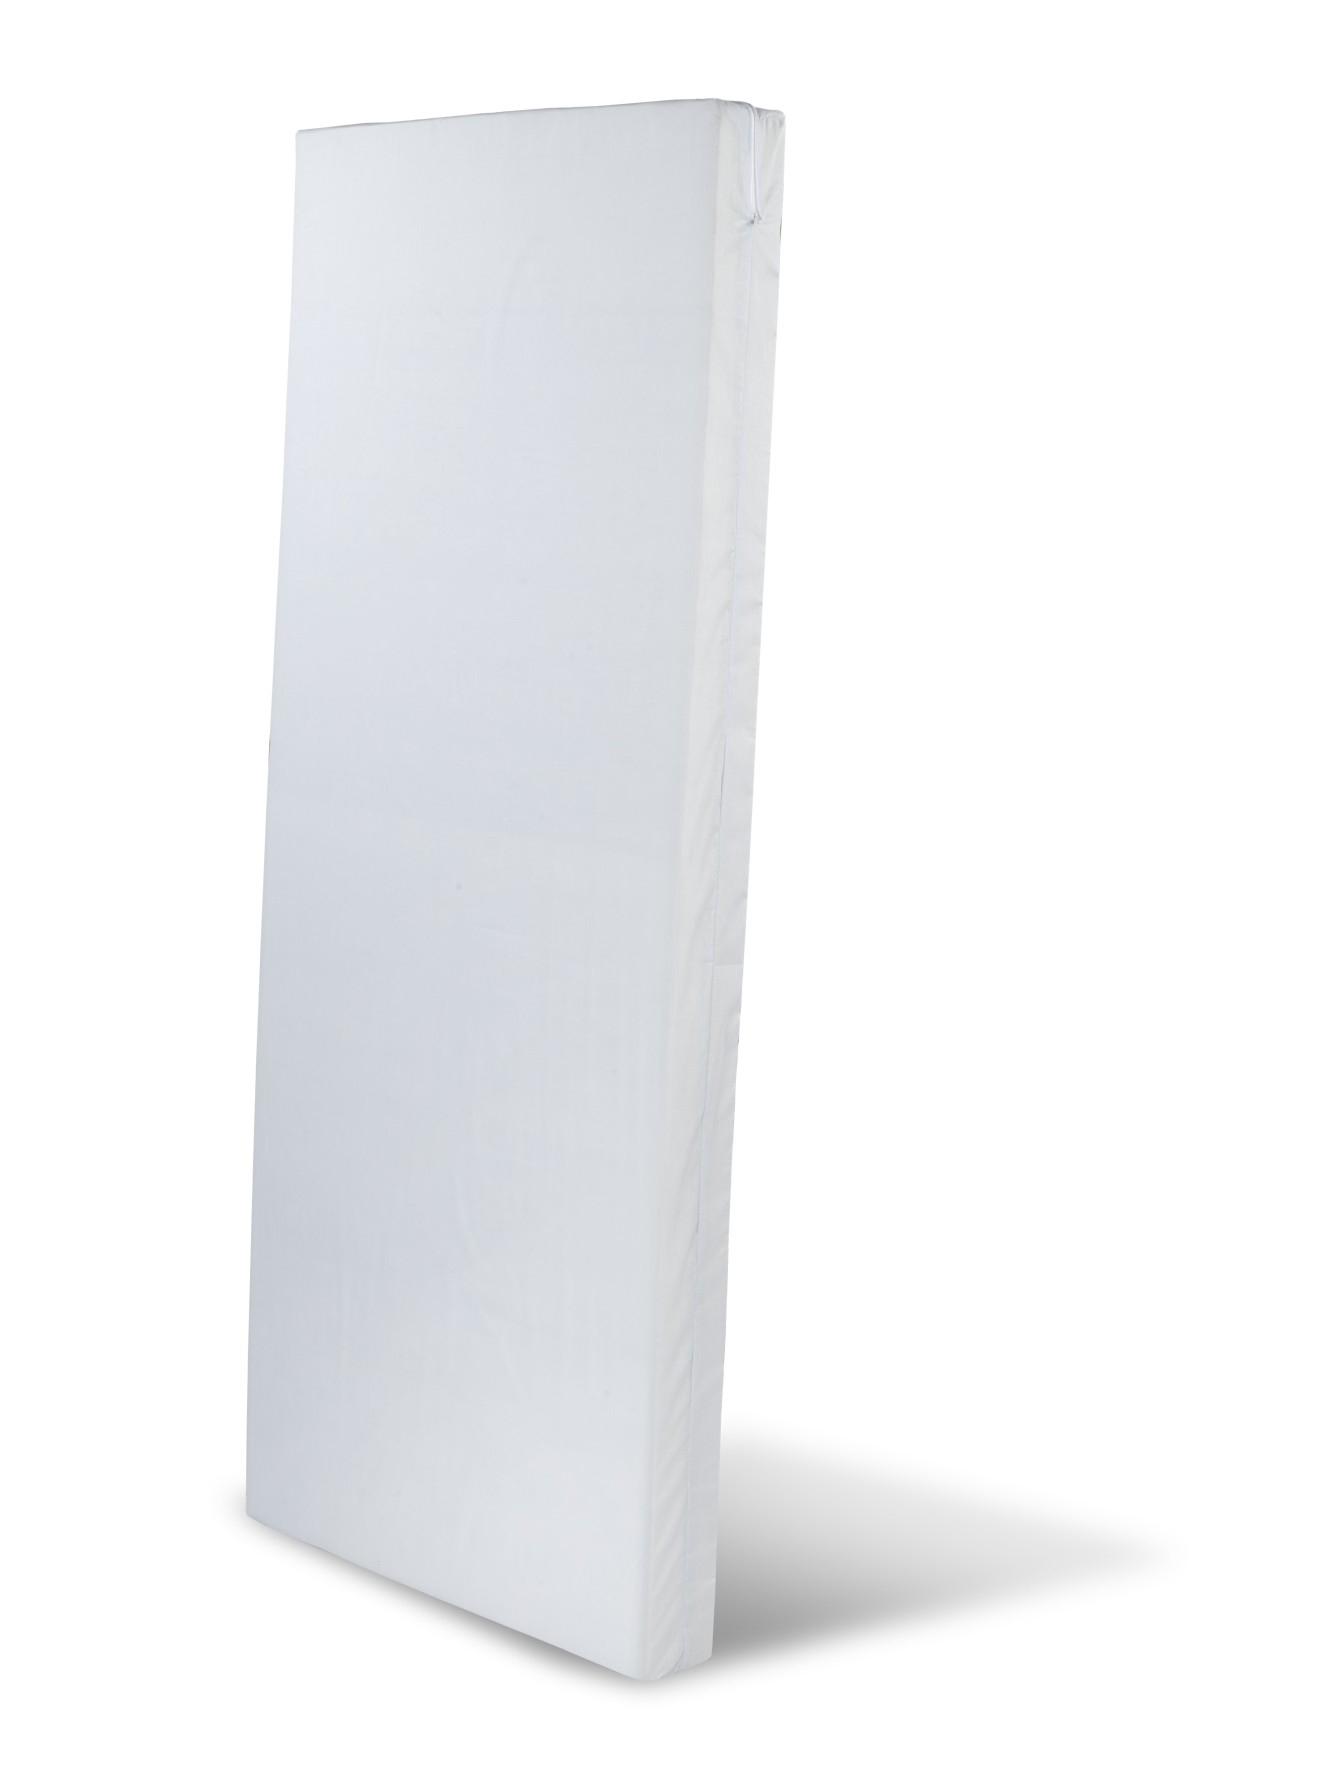 TURYN materac 160x80x9 cm - kolor biały